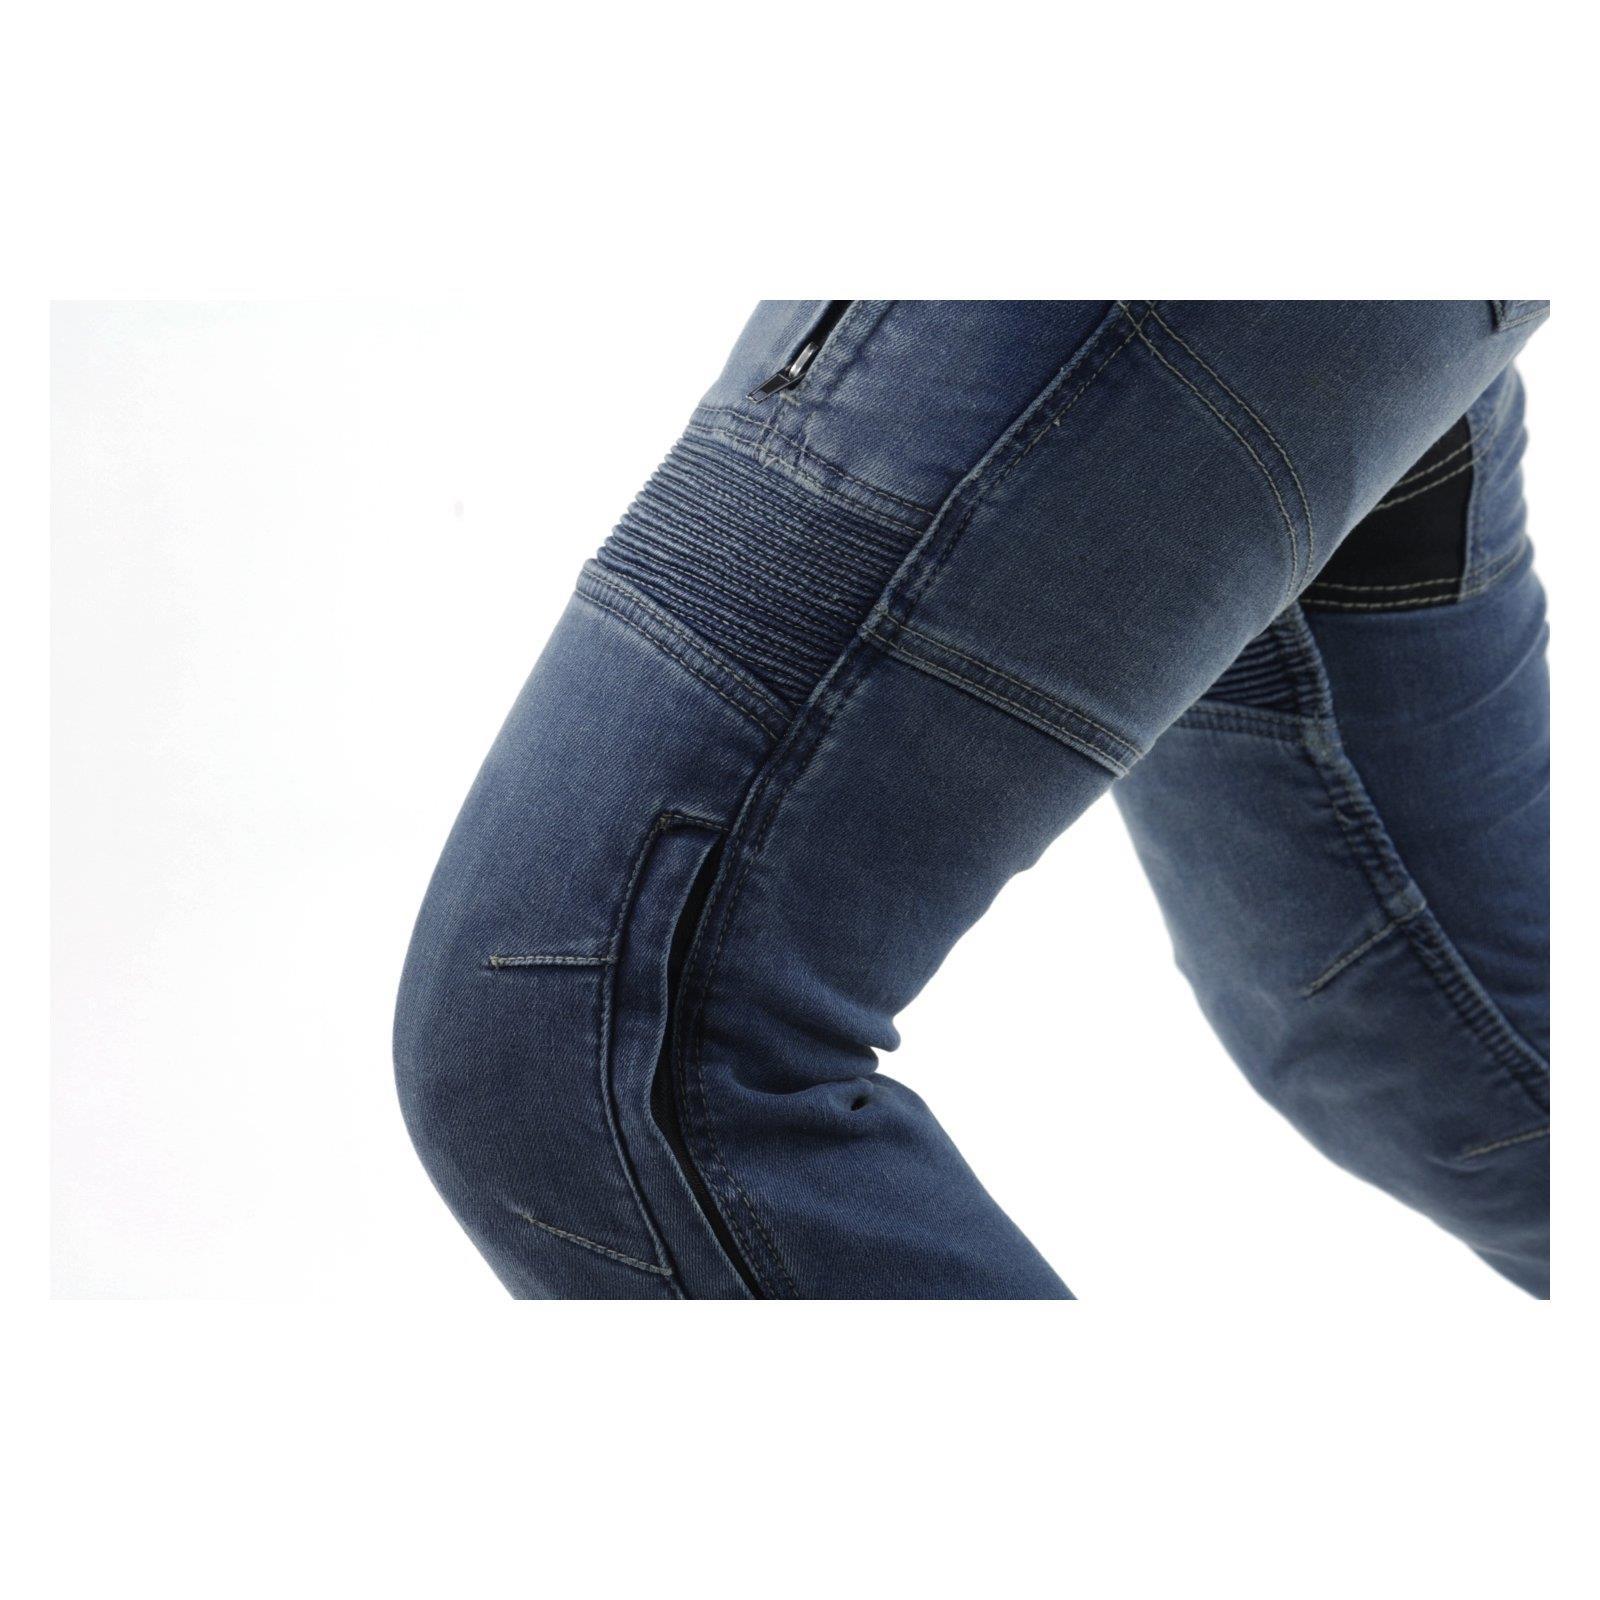 Trilobite-Pantaloni-Moto-Jeans-Abbigliamento-Parado-MICAS-URBAN-DUAL-PANTS-ACID miniatura 82